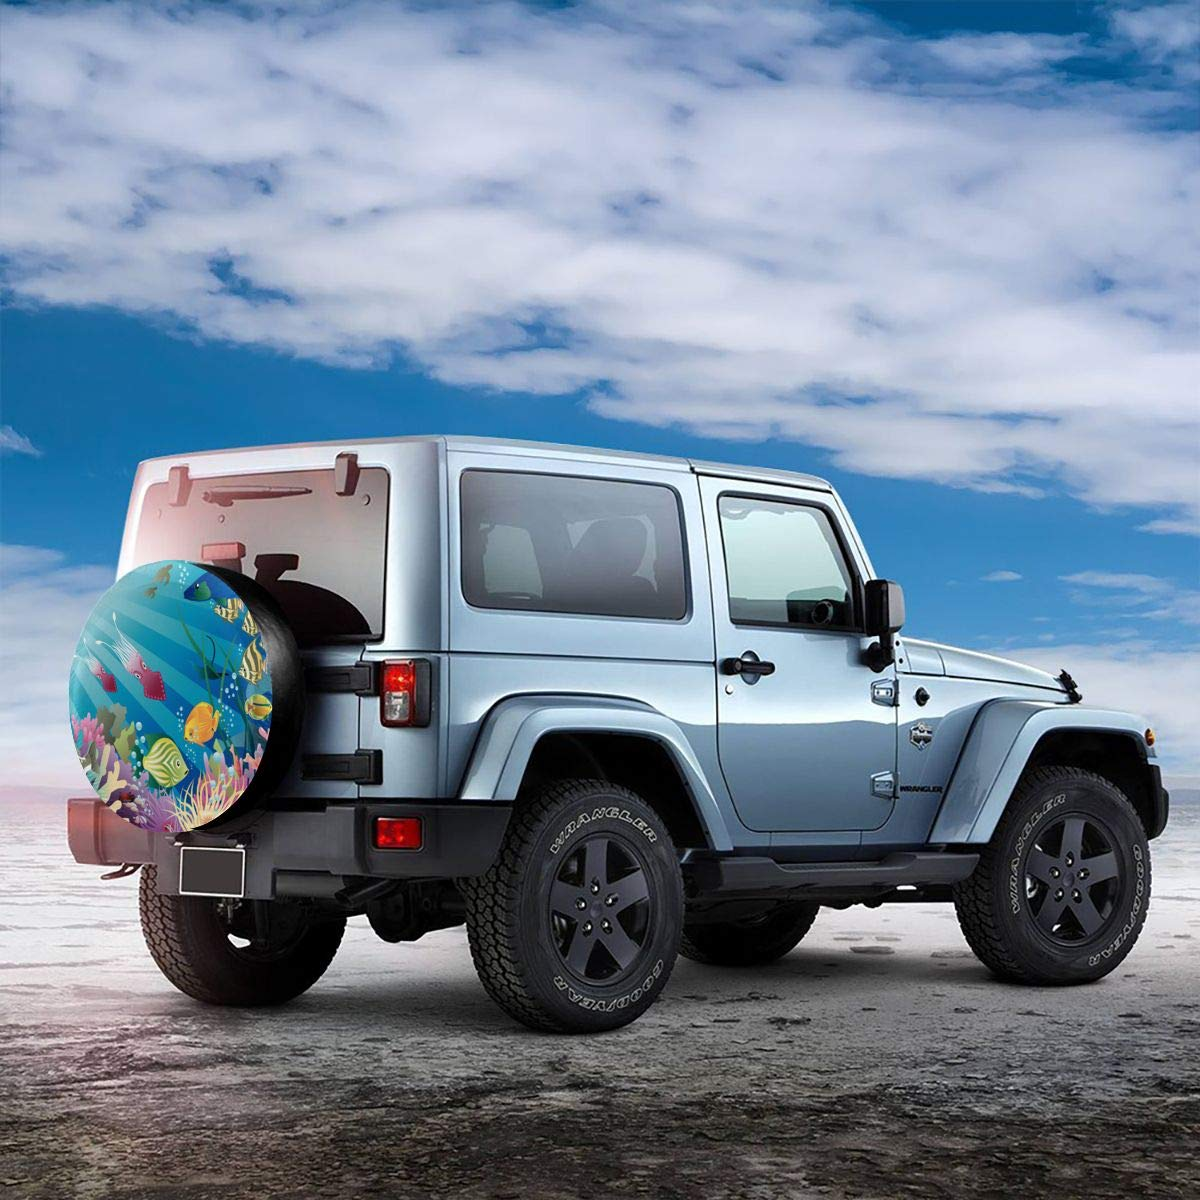 Pokuisnb Sunscreen Fish Tank Aquarium Alphabet Spare Tire Covers for All Cars 17 Inch by Pokuisnb (Image #3)